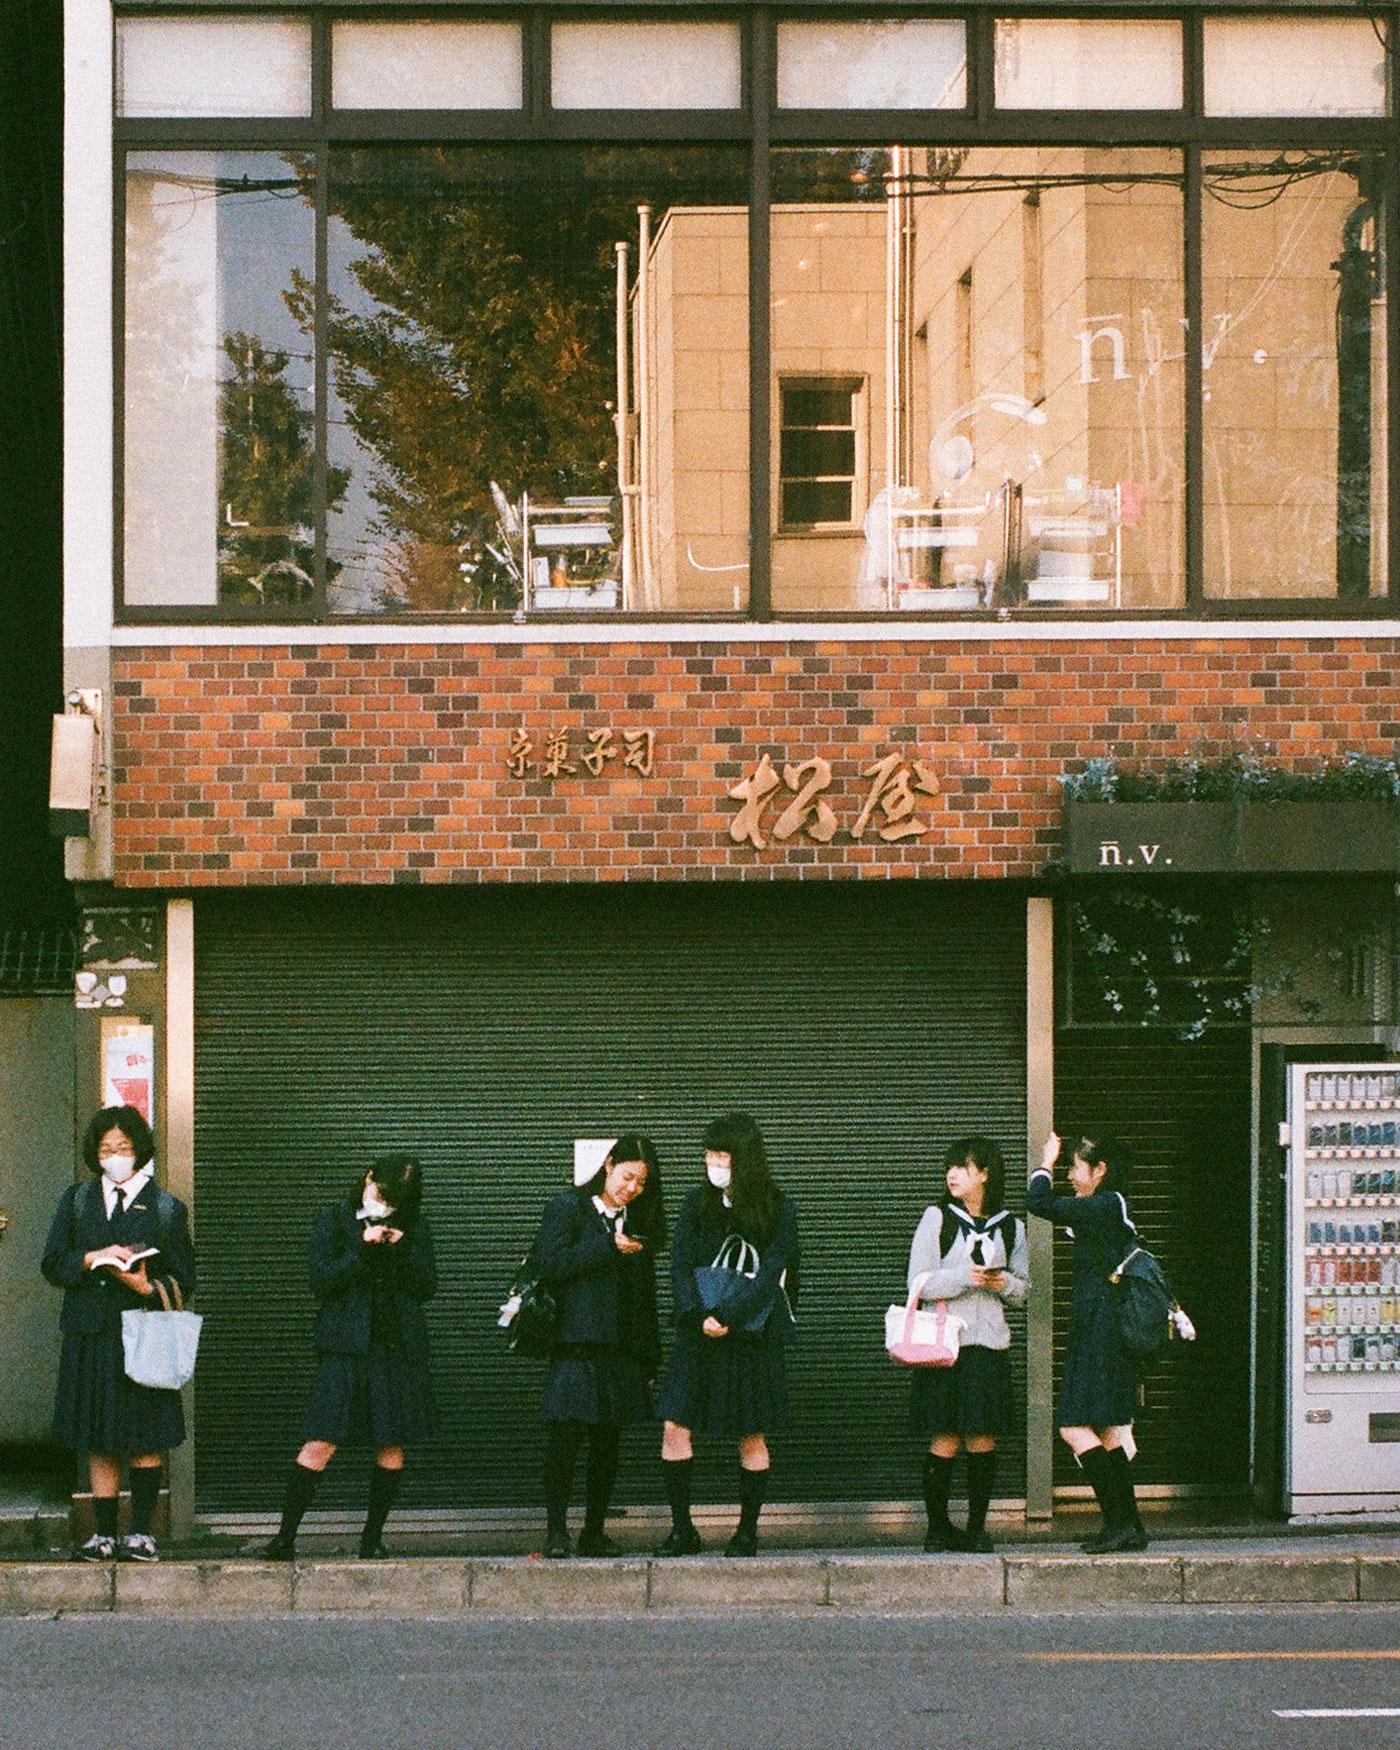 alex-laniosz-film-japan-school-girls.jpg